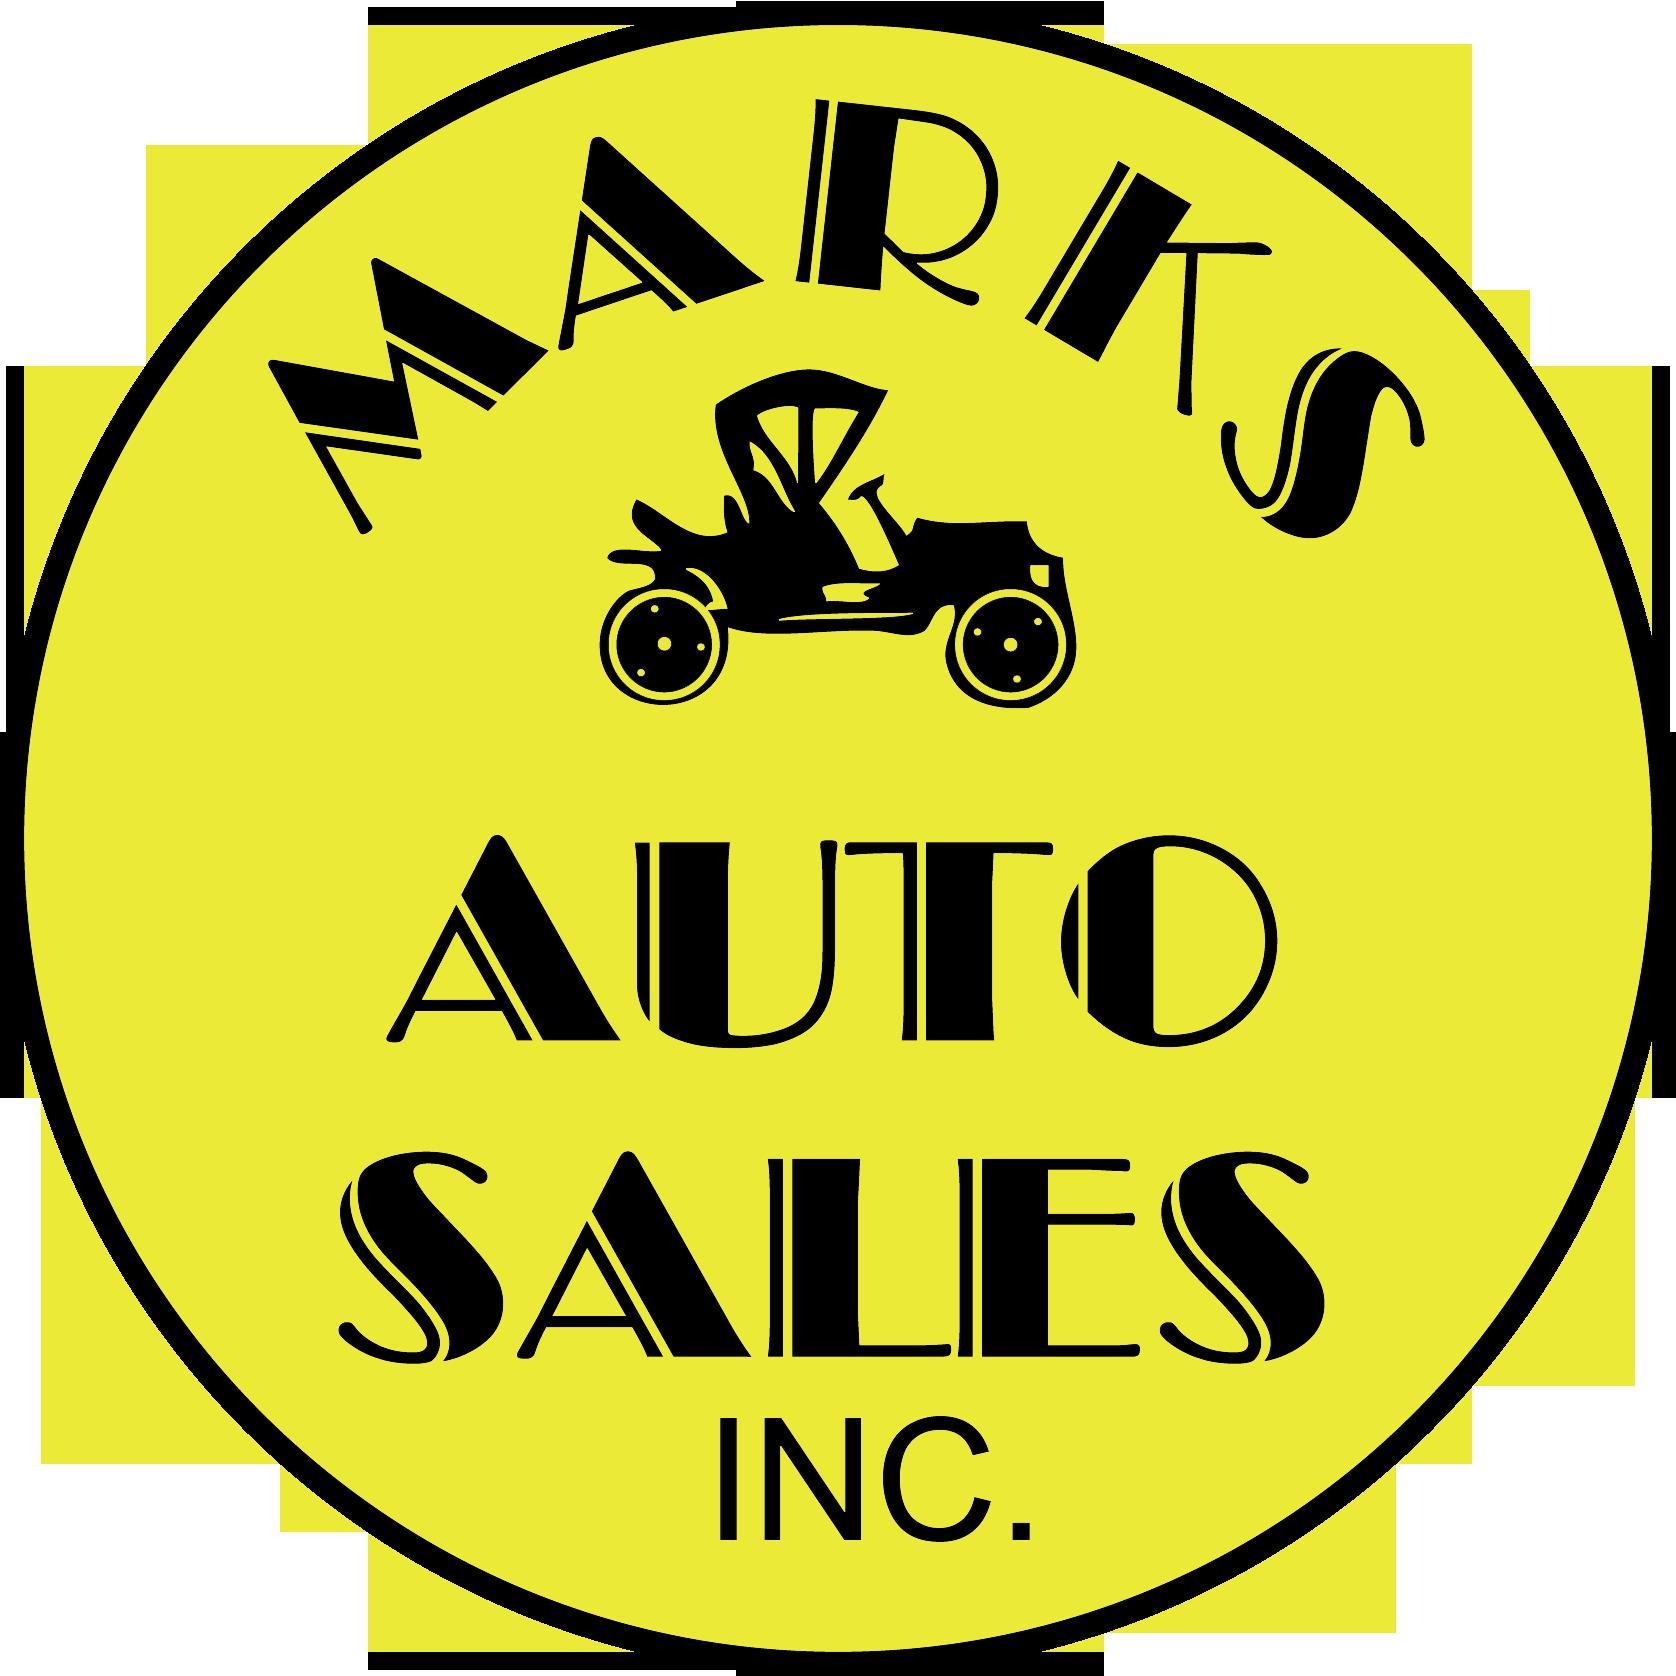 Mark's Auto Sales Inc.